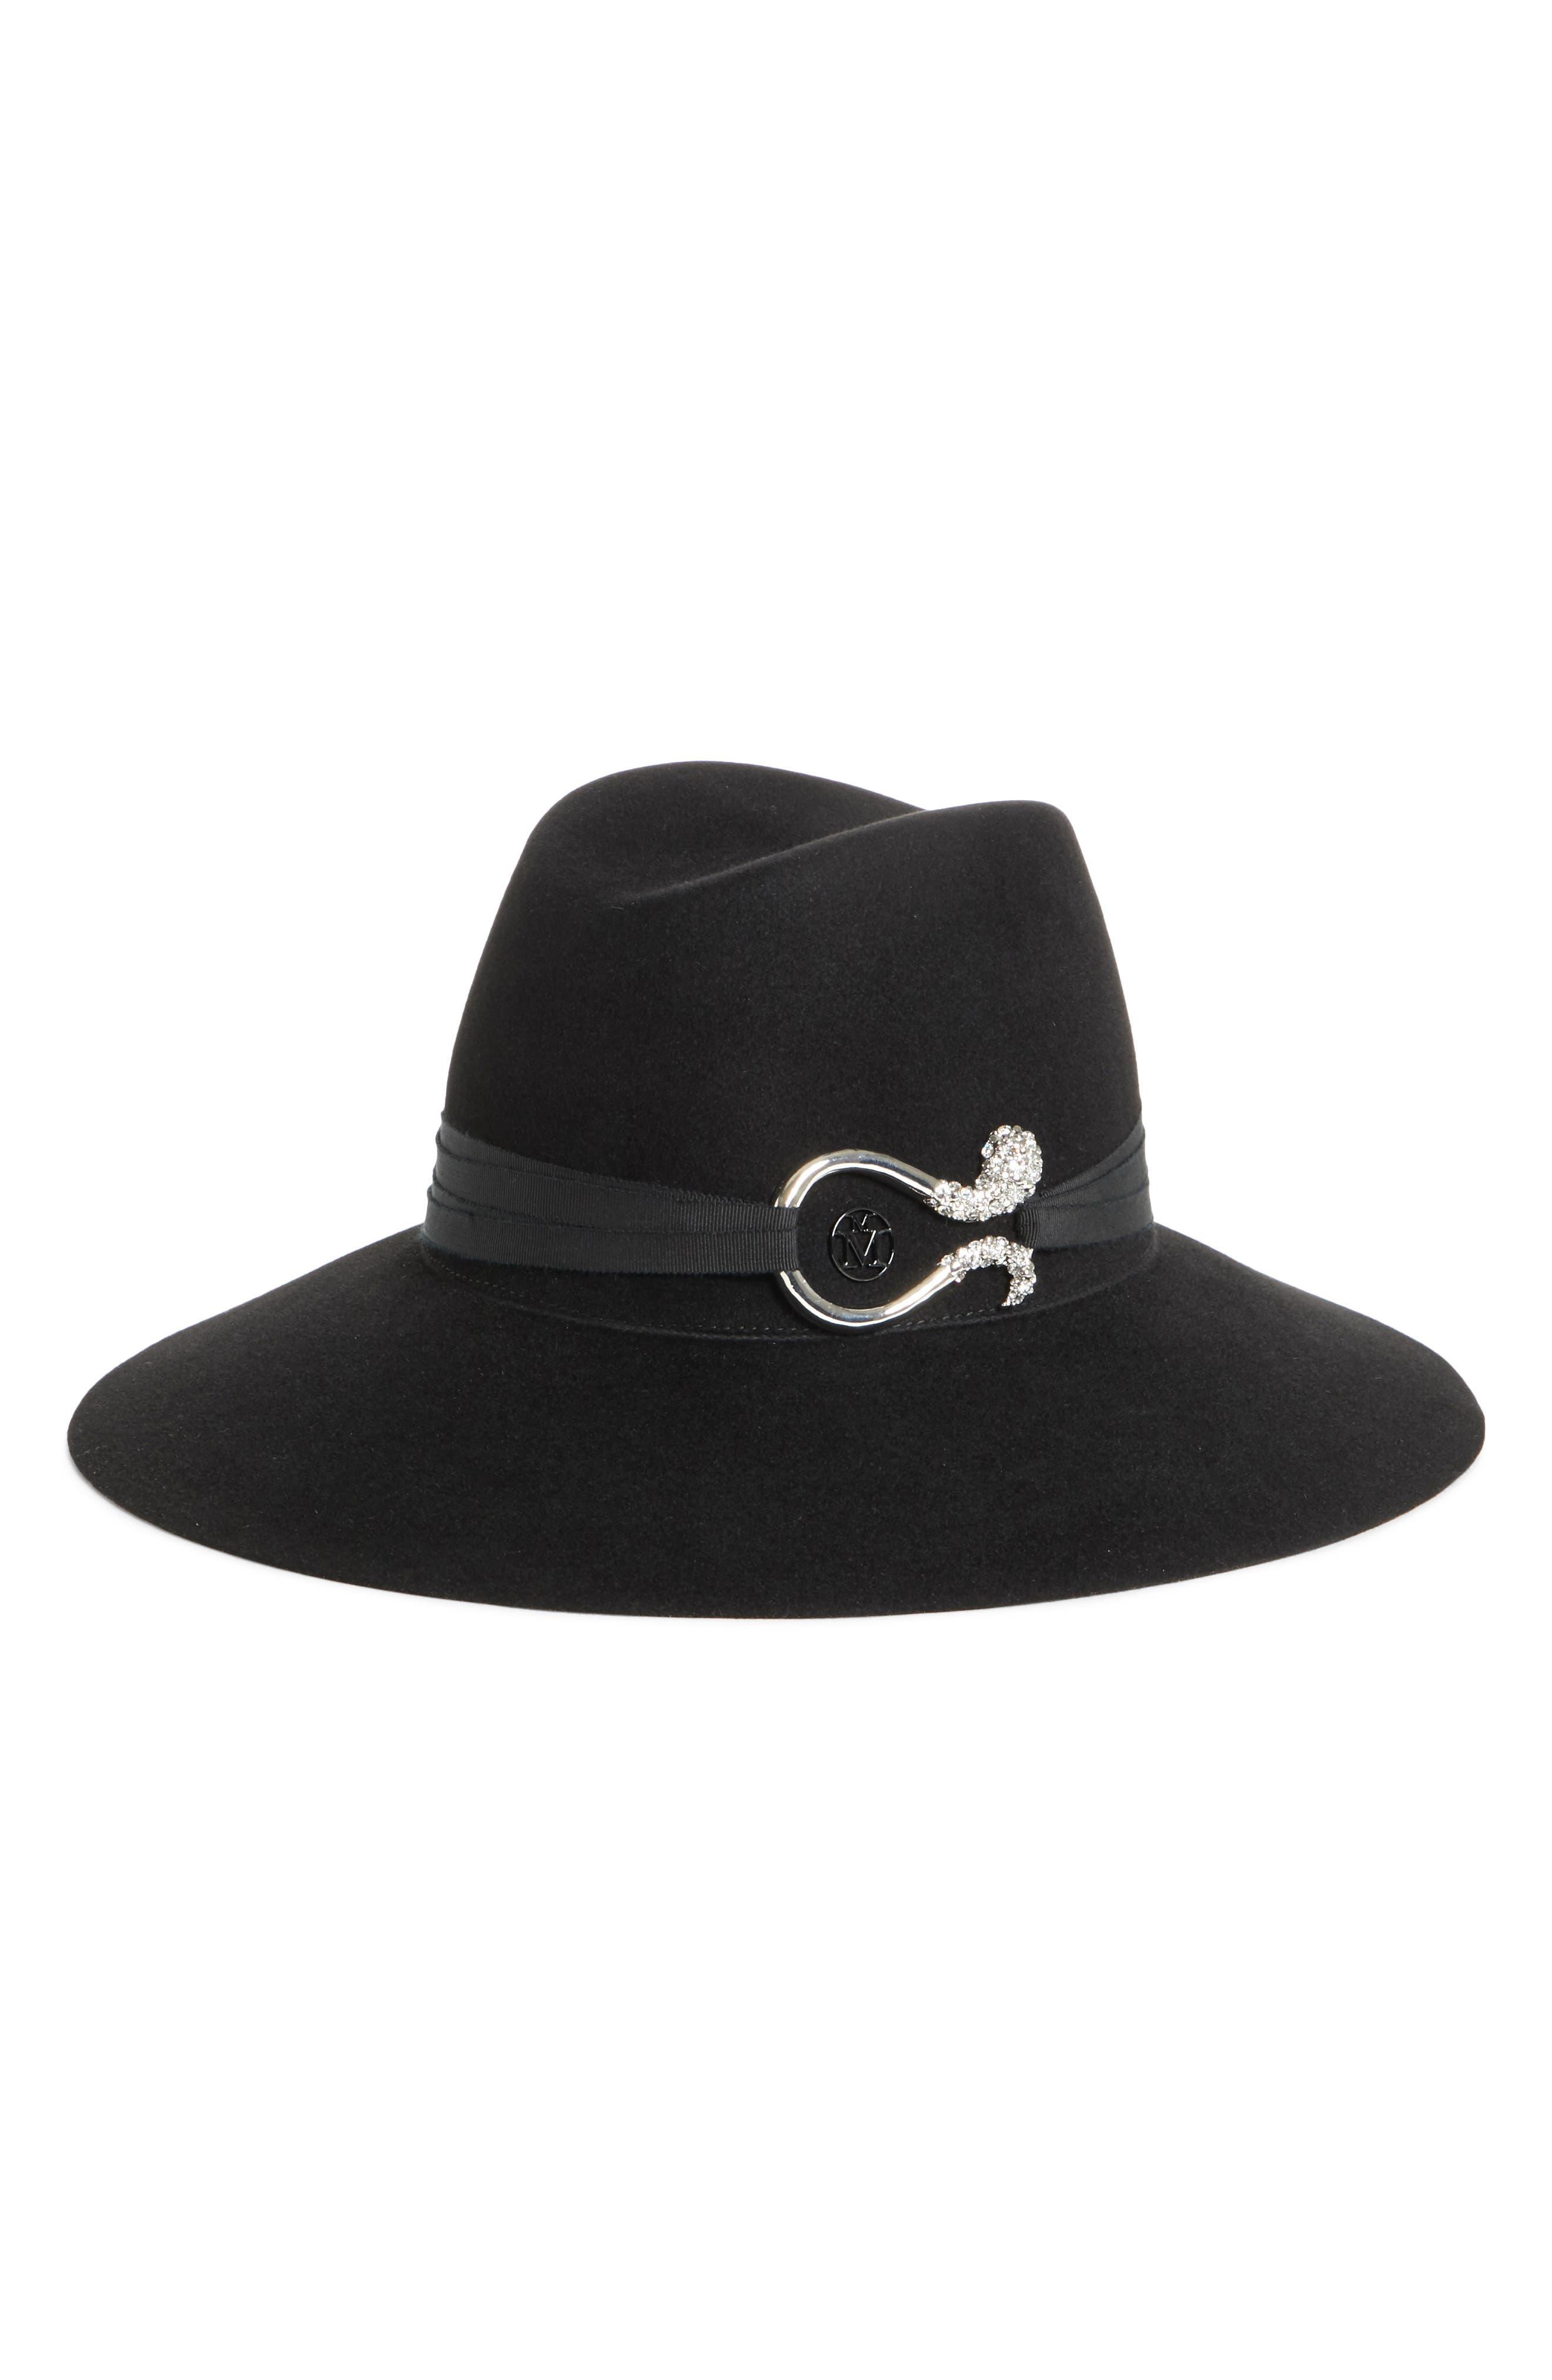 Kate Strass Tentacles Rabbit Hair Felt Hat,                             Main thumbnail 1, color,                             BLACK